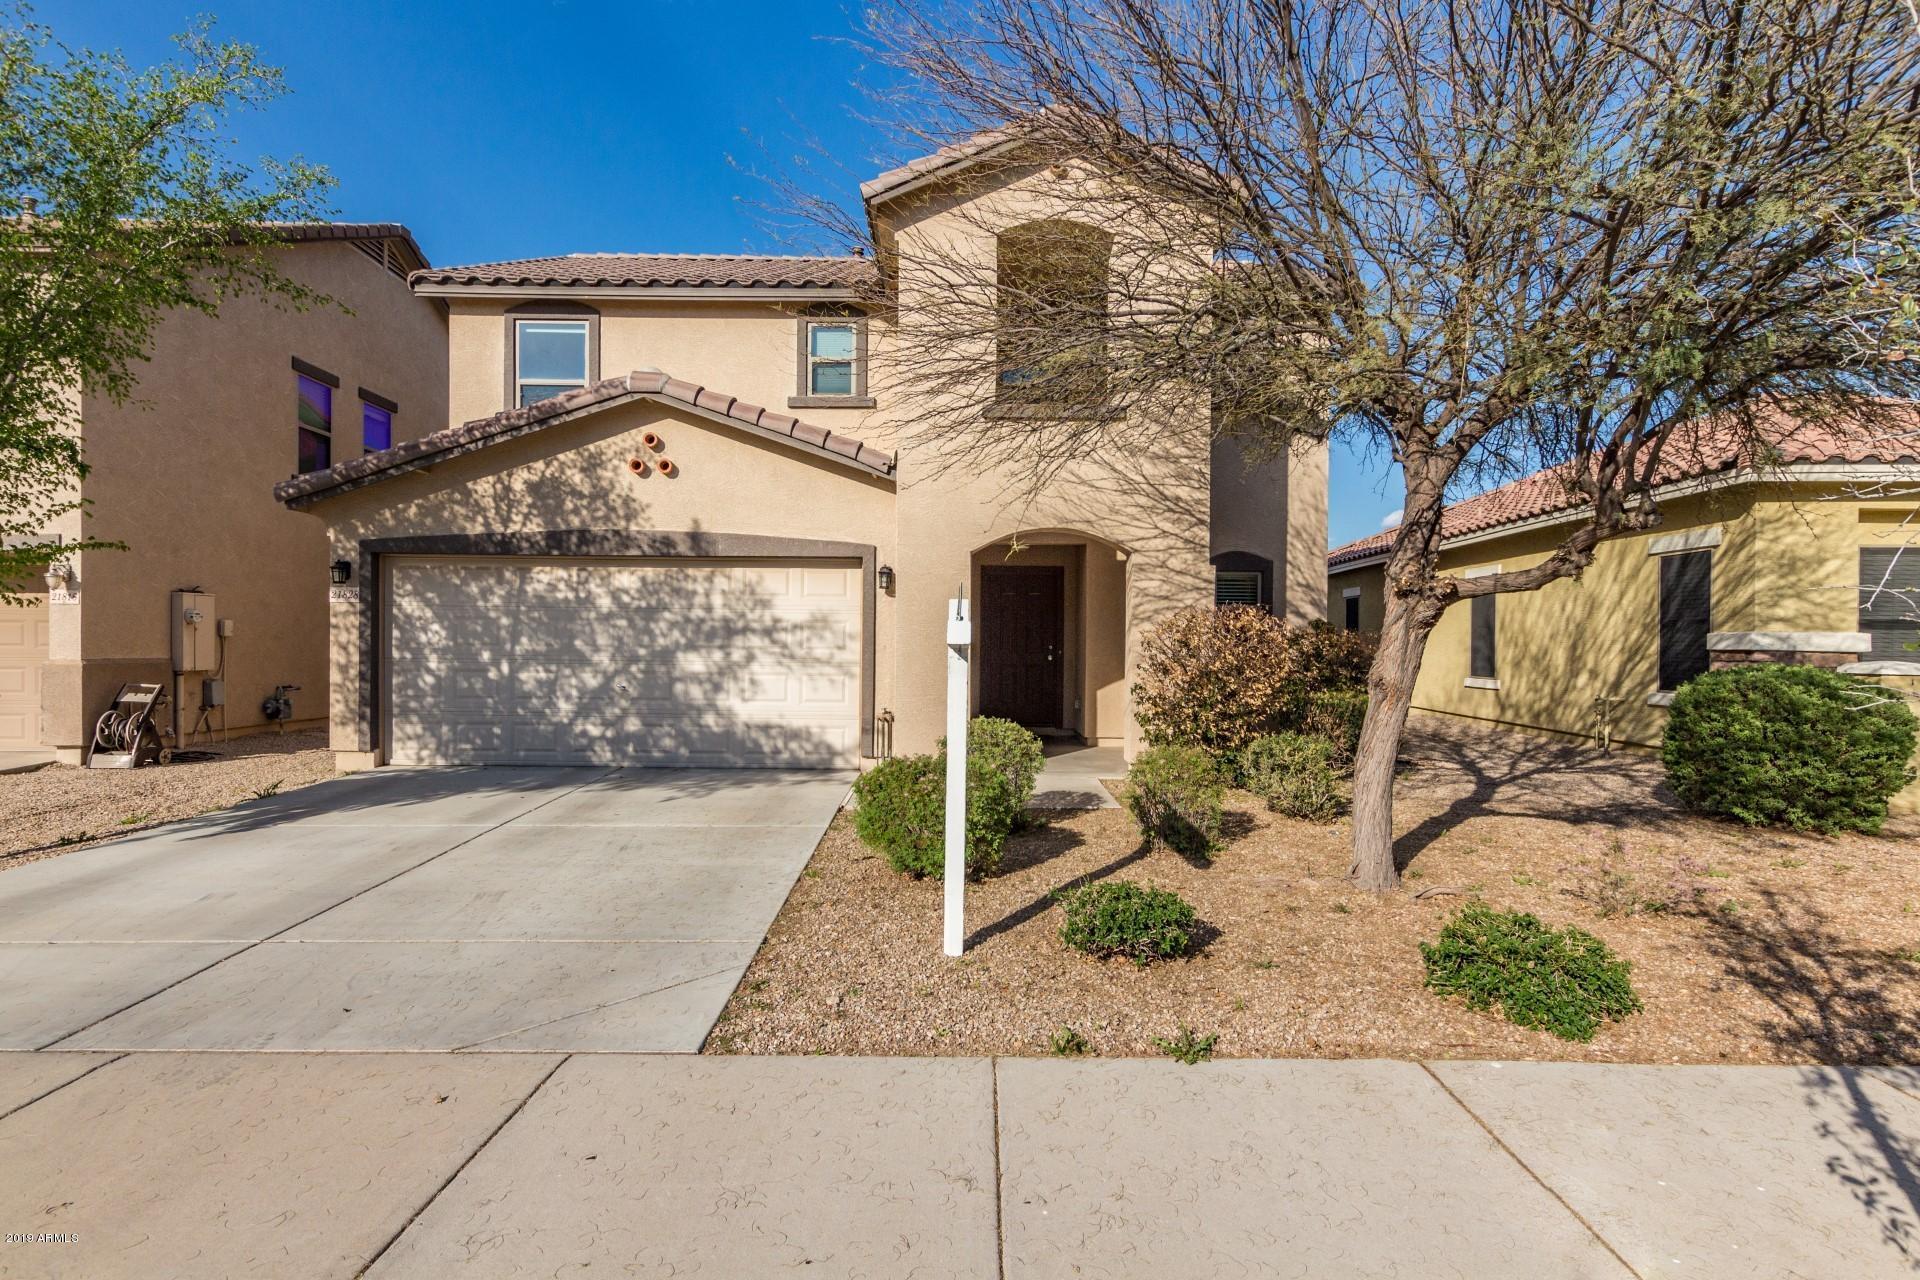 Photo of 21828 E CREOSOTE Drive, Queen Creek, AZ 85142